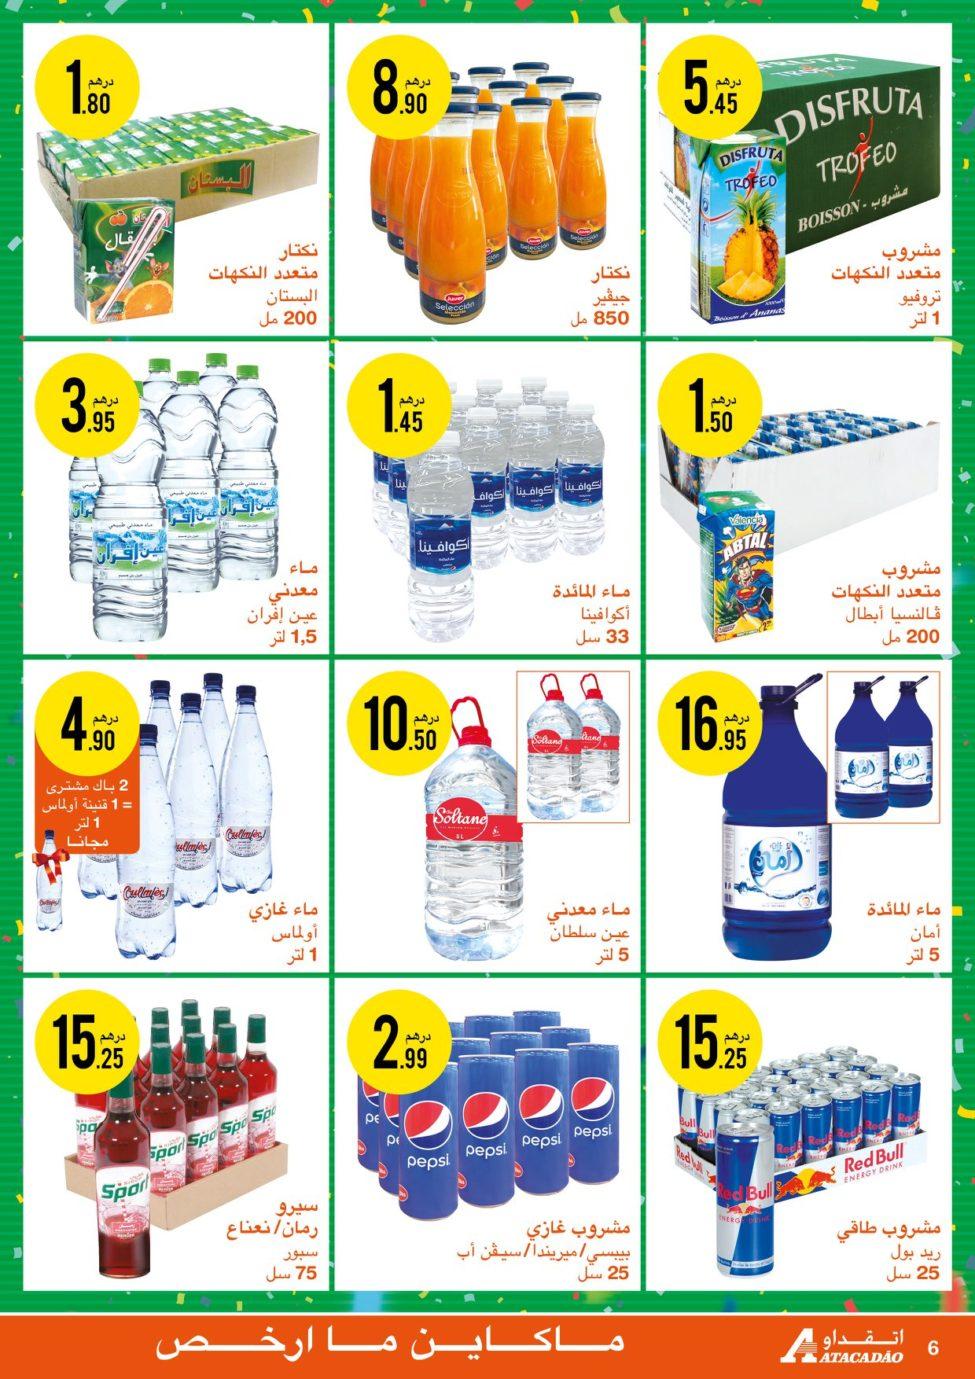 Catalogue Atacadao Maroc du 6 au 26 Juin 2019